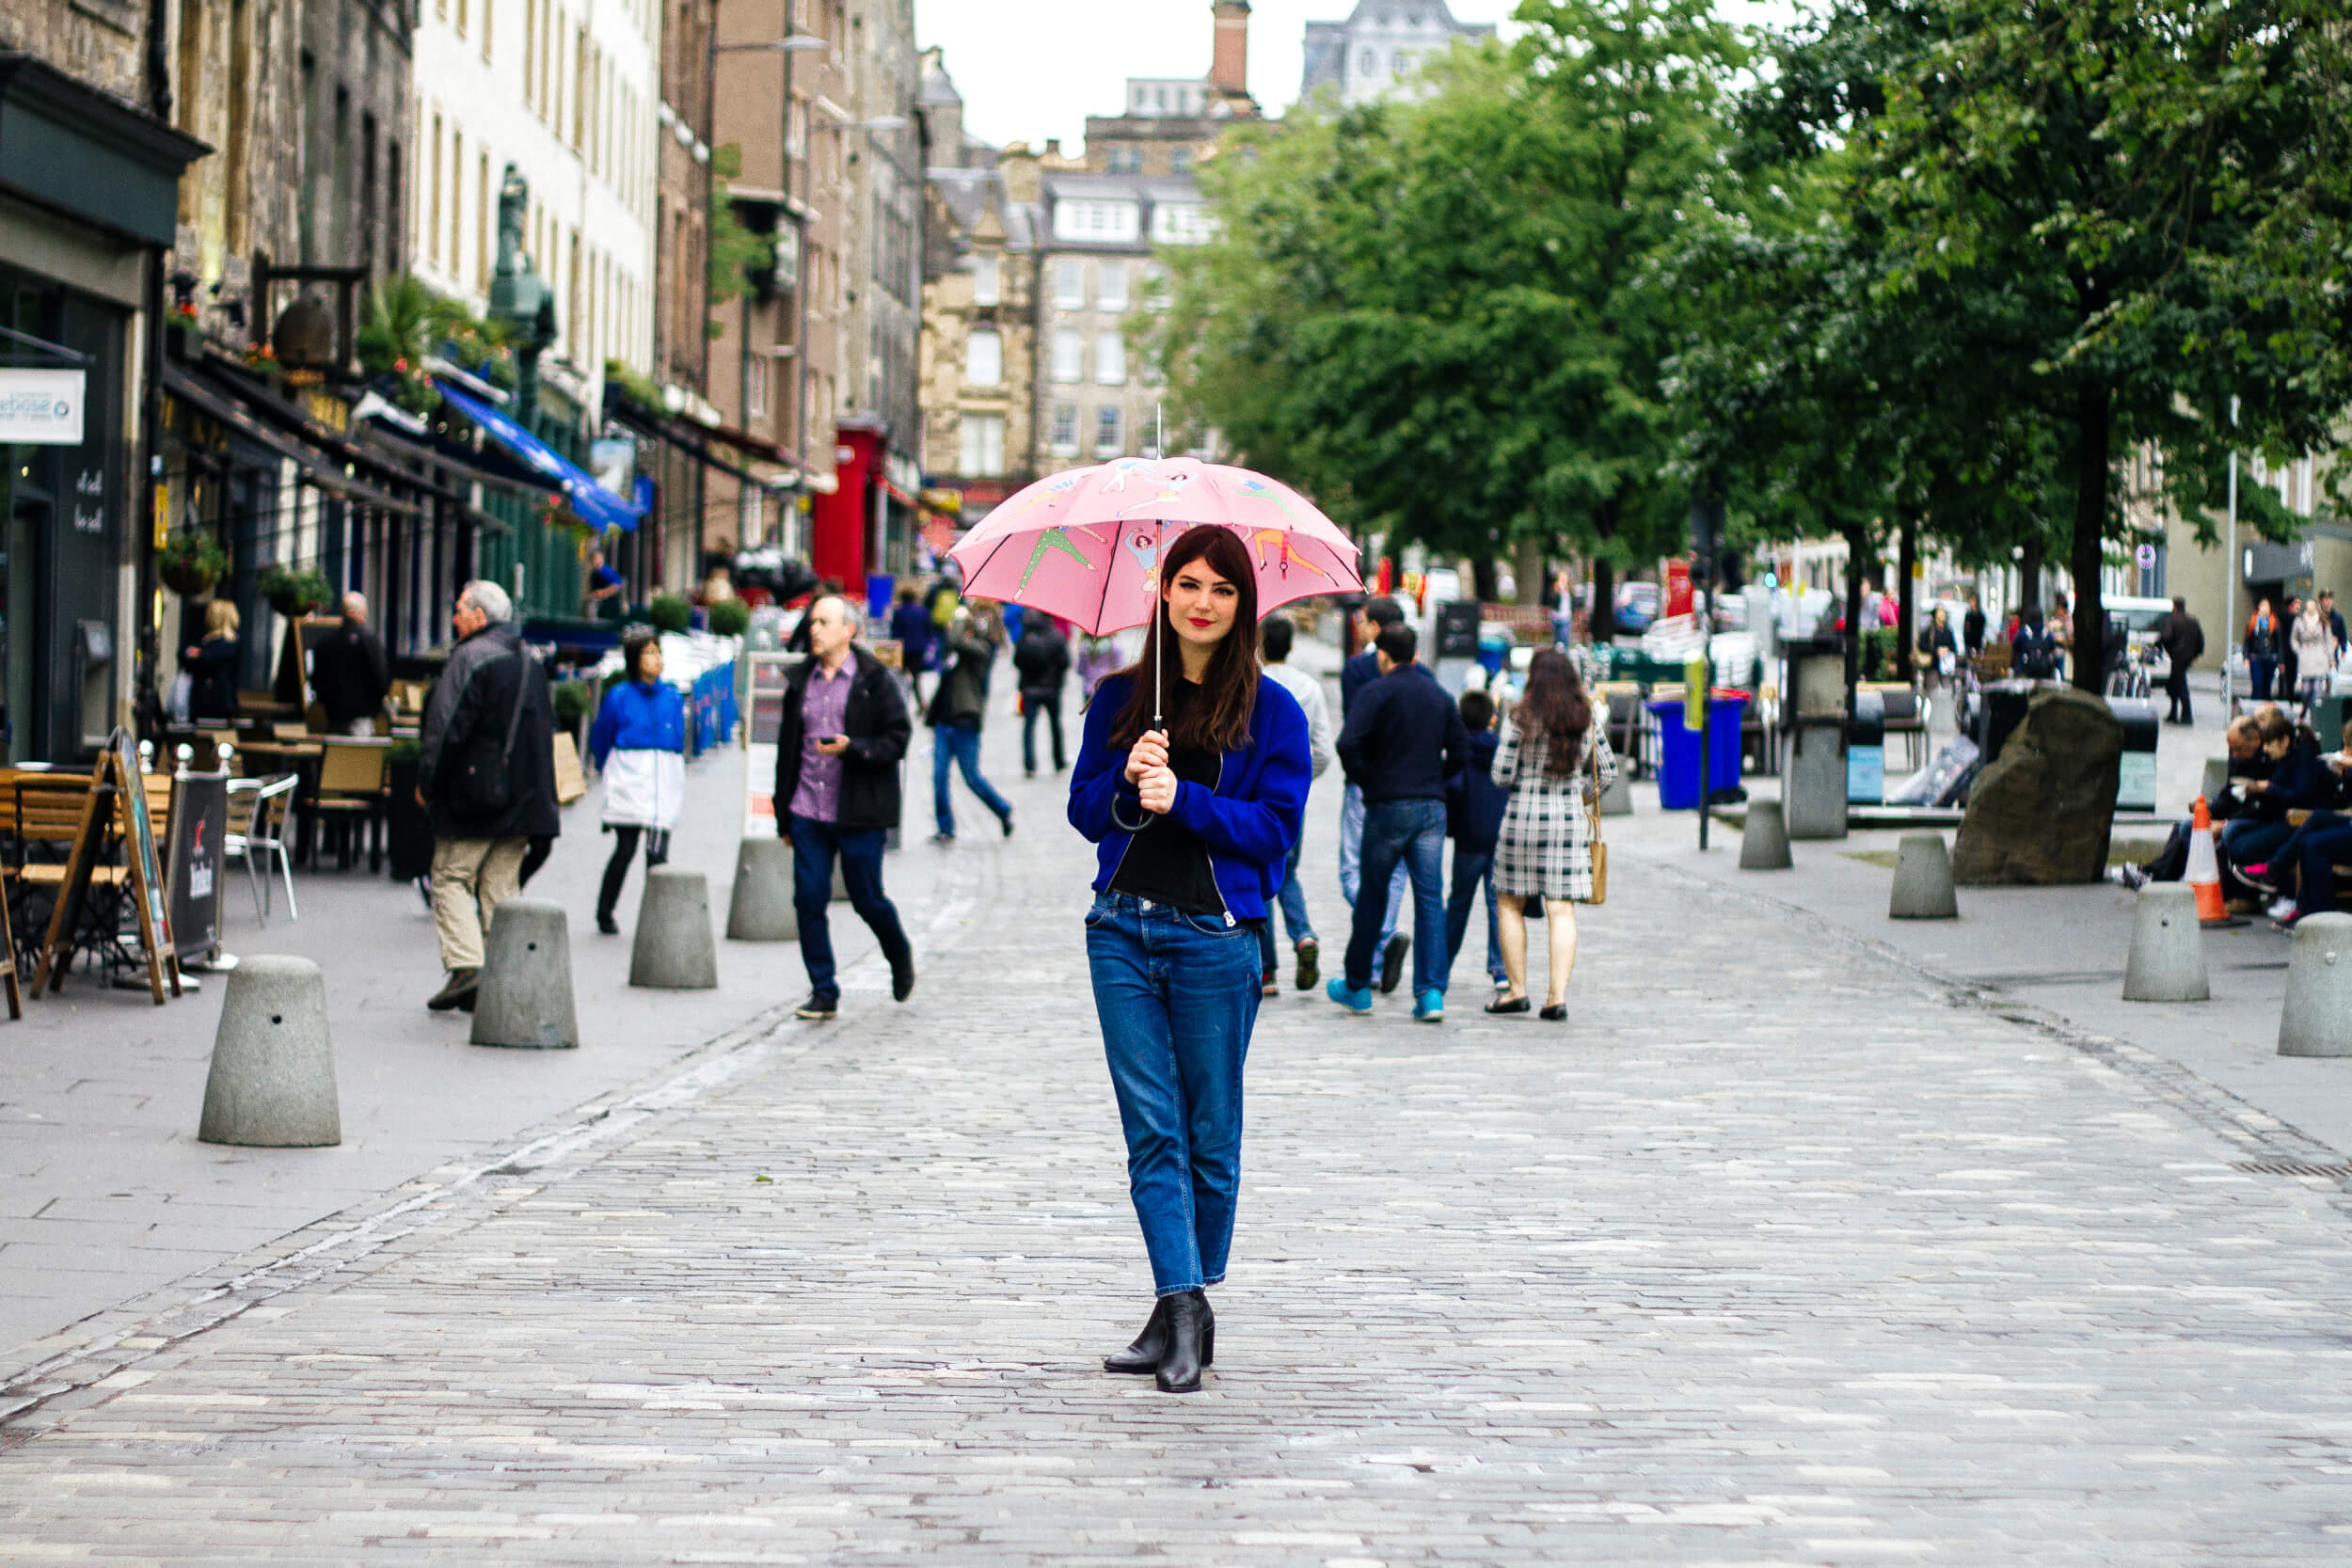 Karen Mabon in the Grassmarket, Edinburgh, with the Rain Dance umbrella - photo by Future Positive Studio